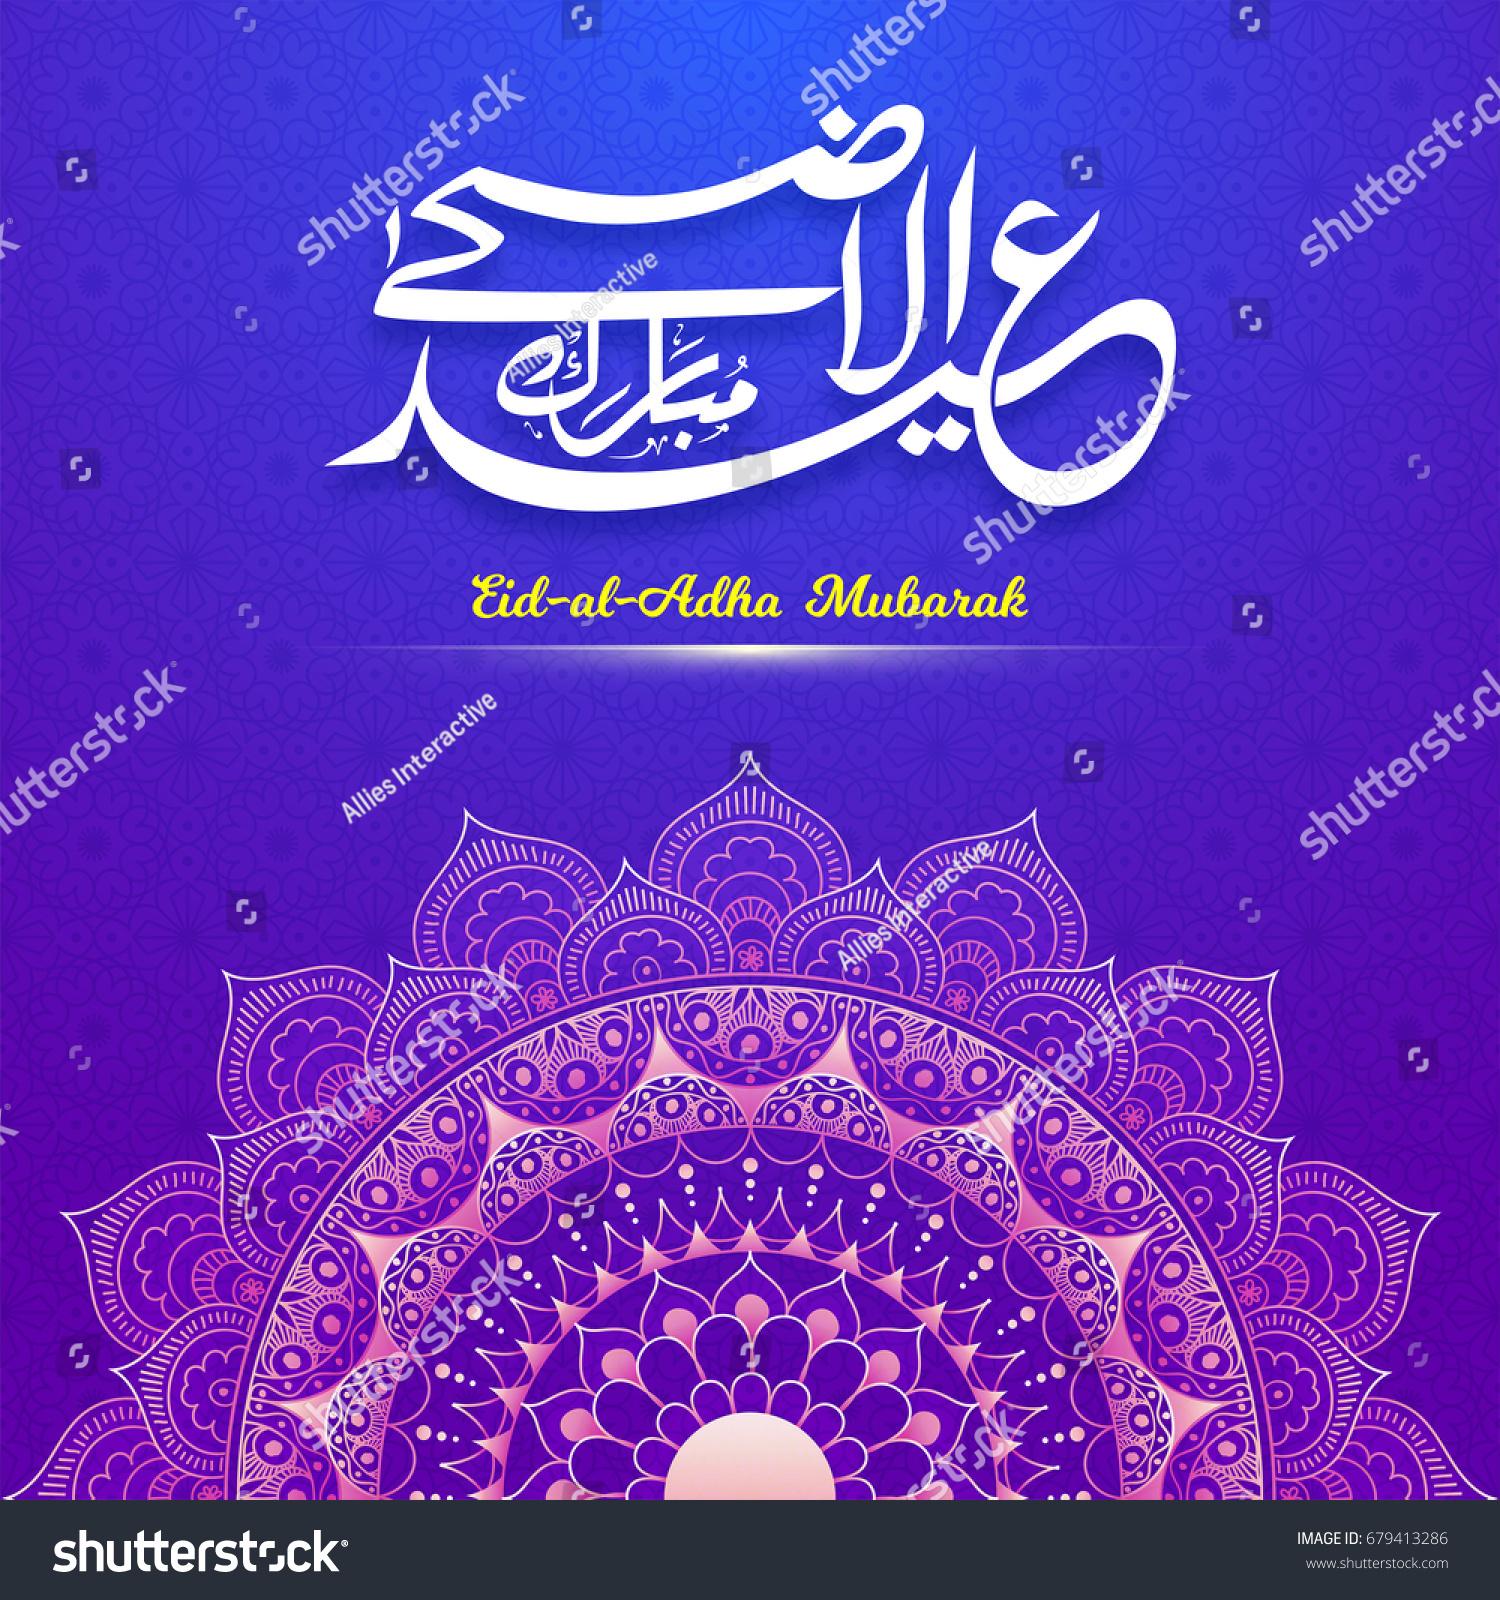 Islamic Festival Sacrifice Eid Al Adha Mubarak Greeting Stock Vector